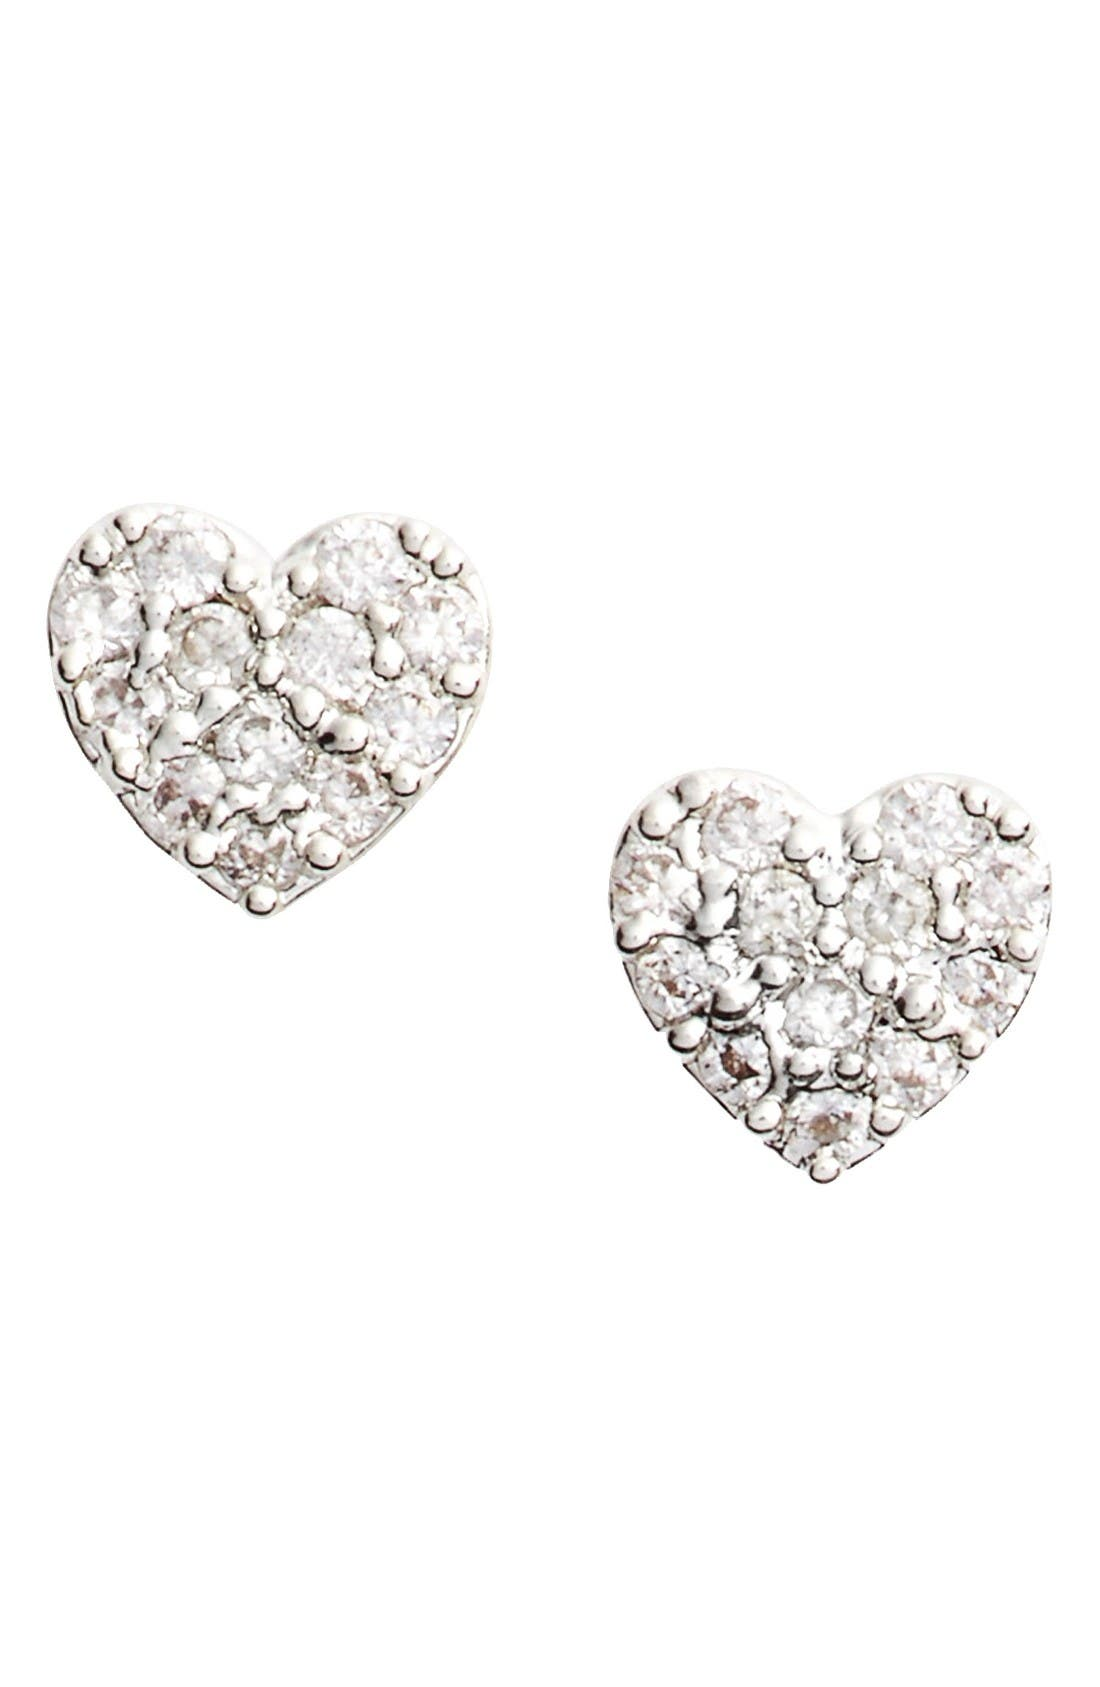 Shine Bright Heart Stud Earrings,                             Main thumbnail 1, color,                             Silver